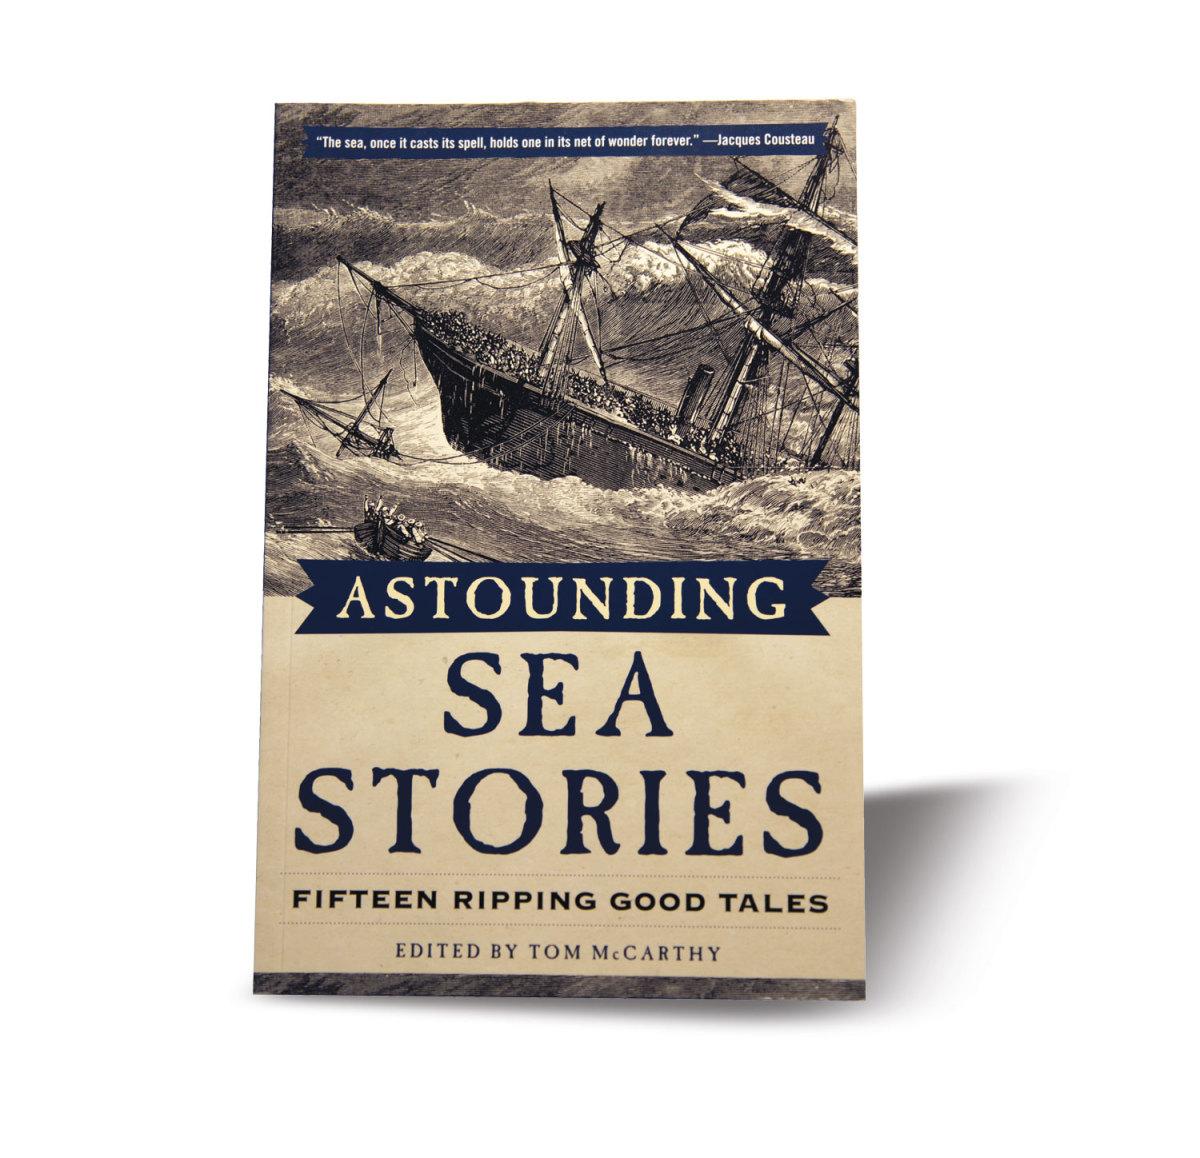 Astounding Sea Stories